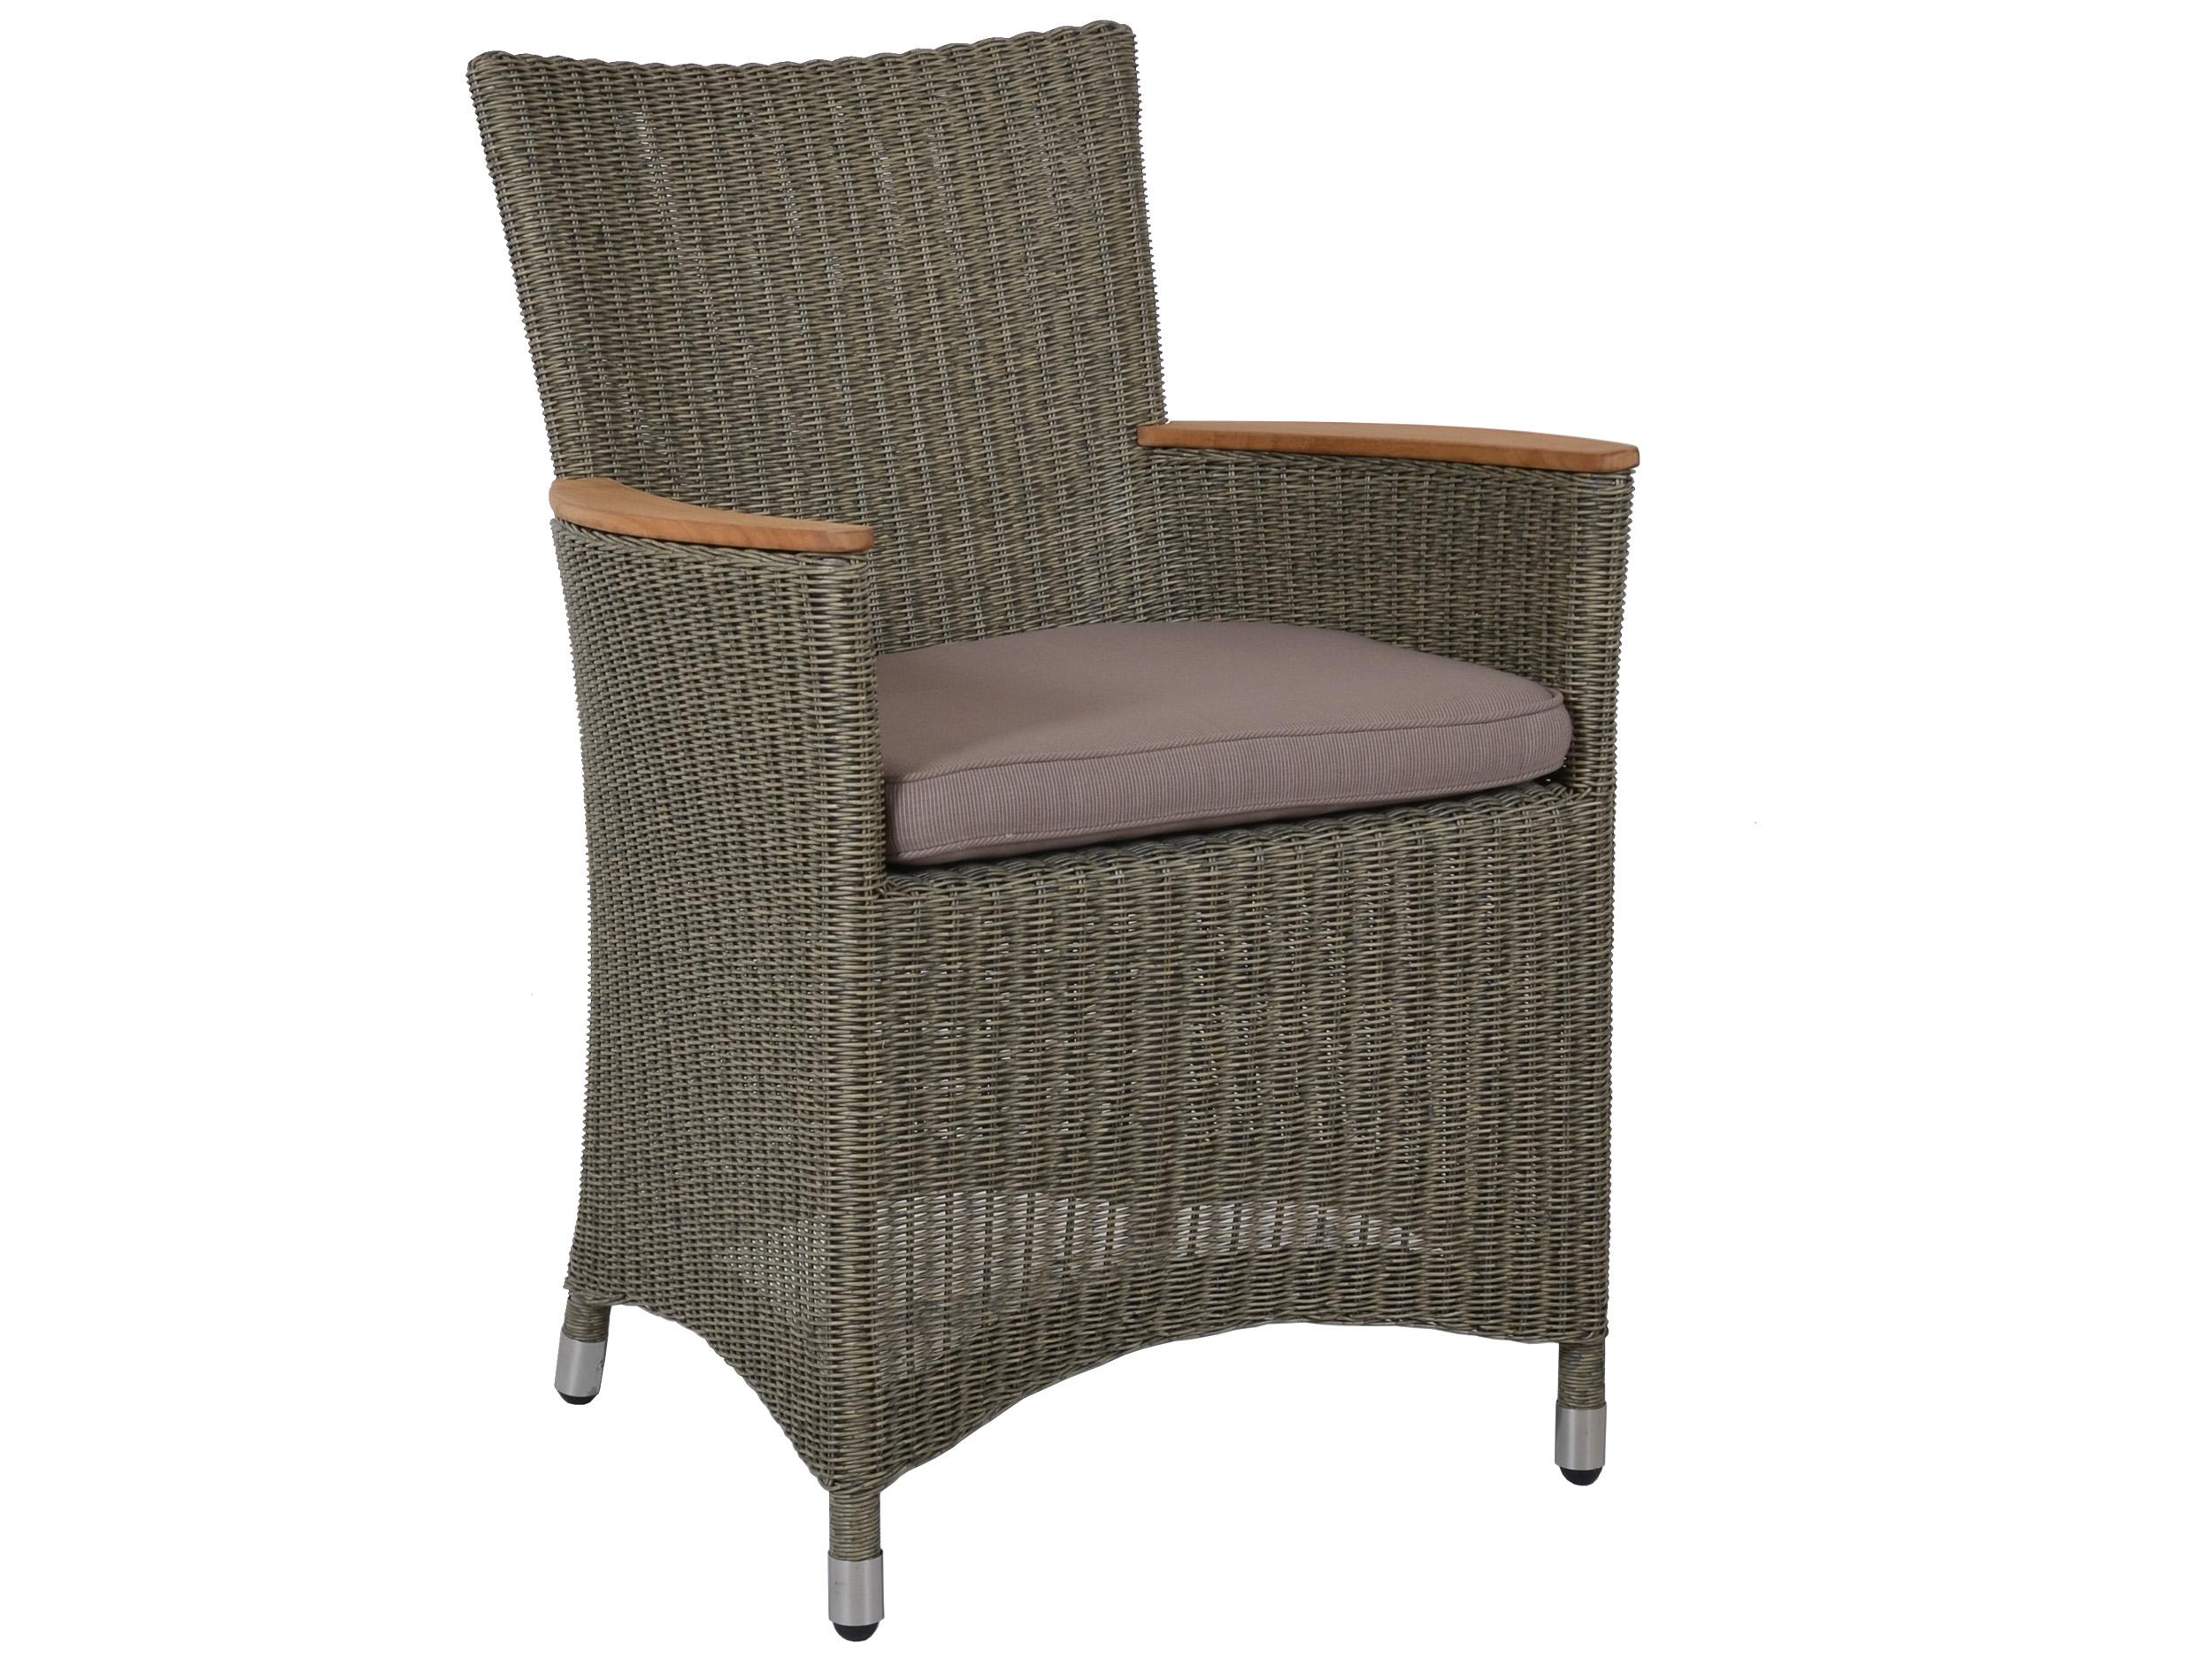 polyrattan gartensessel mit teakholz armlehnen gartenm bel l nse. Black Bedroom Furniture Sets. Home Design Ideas